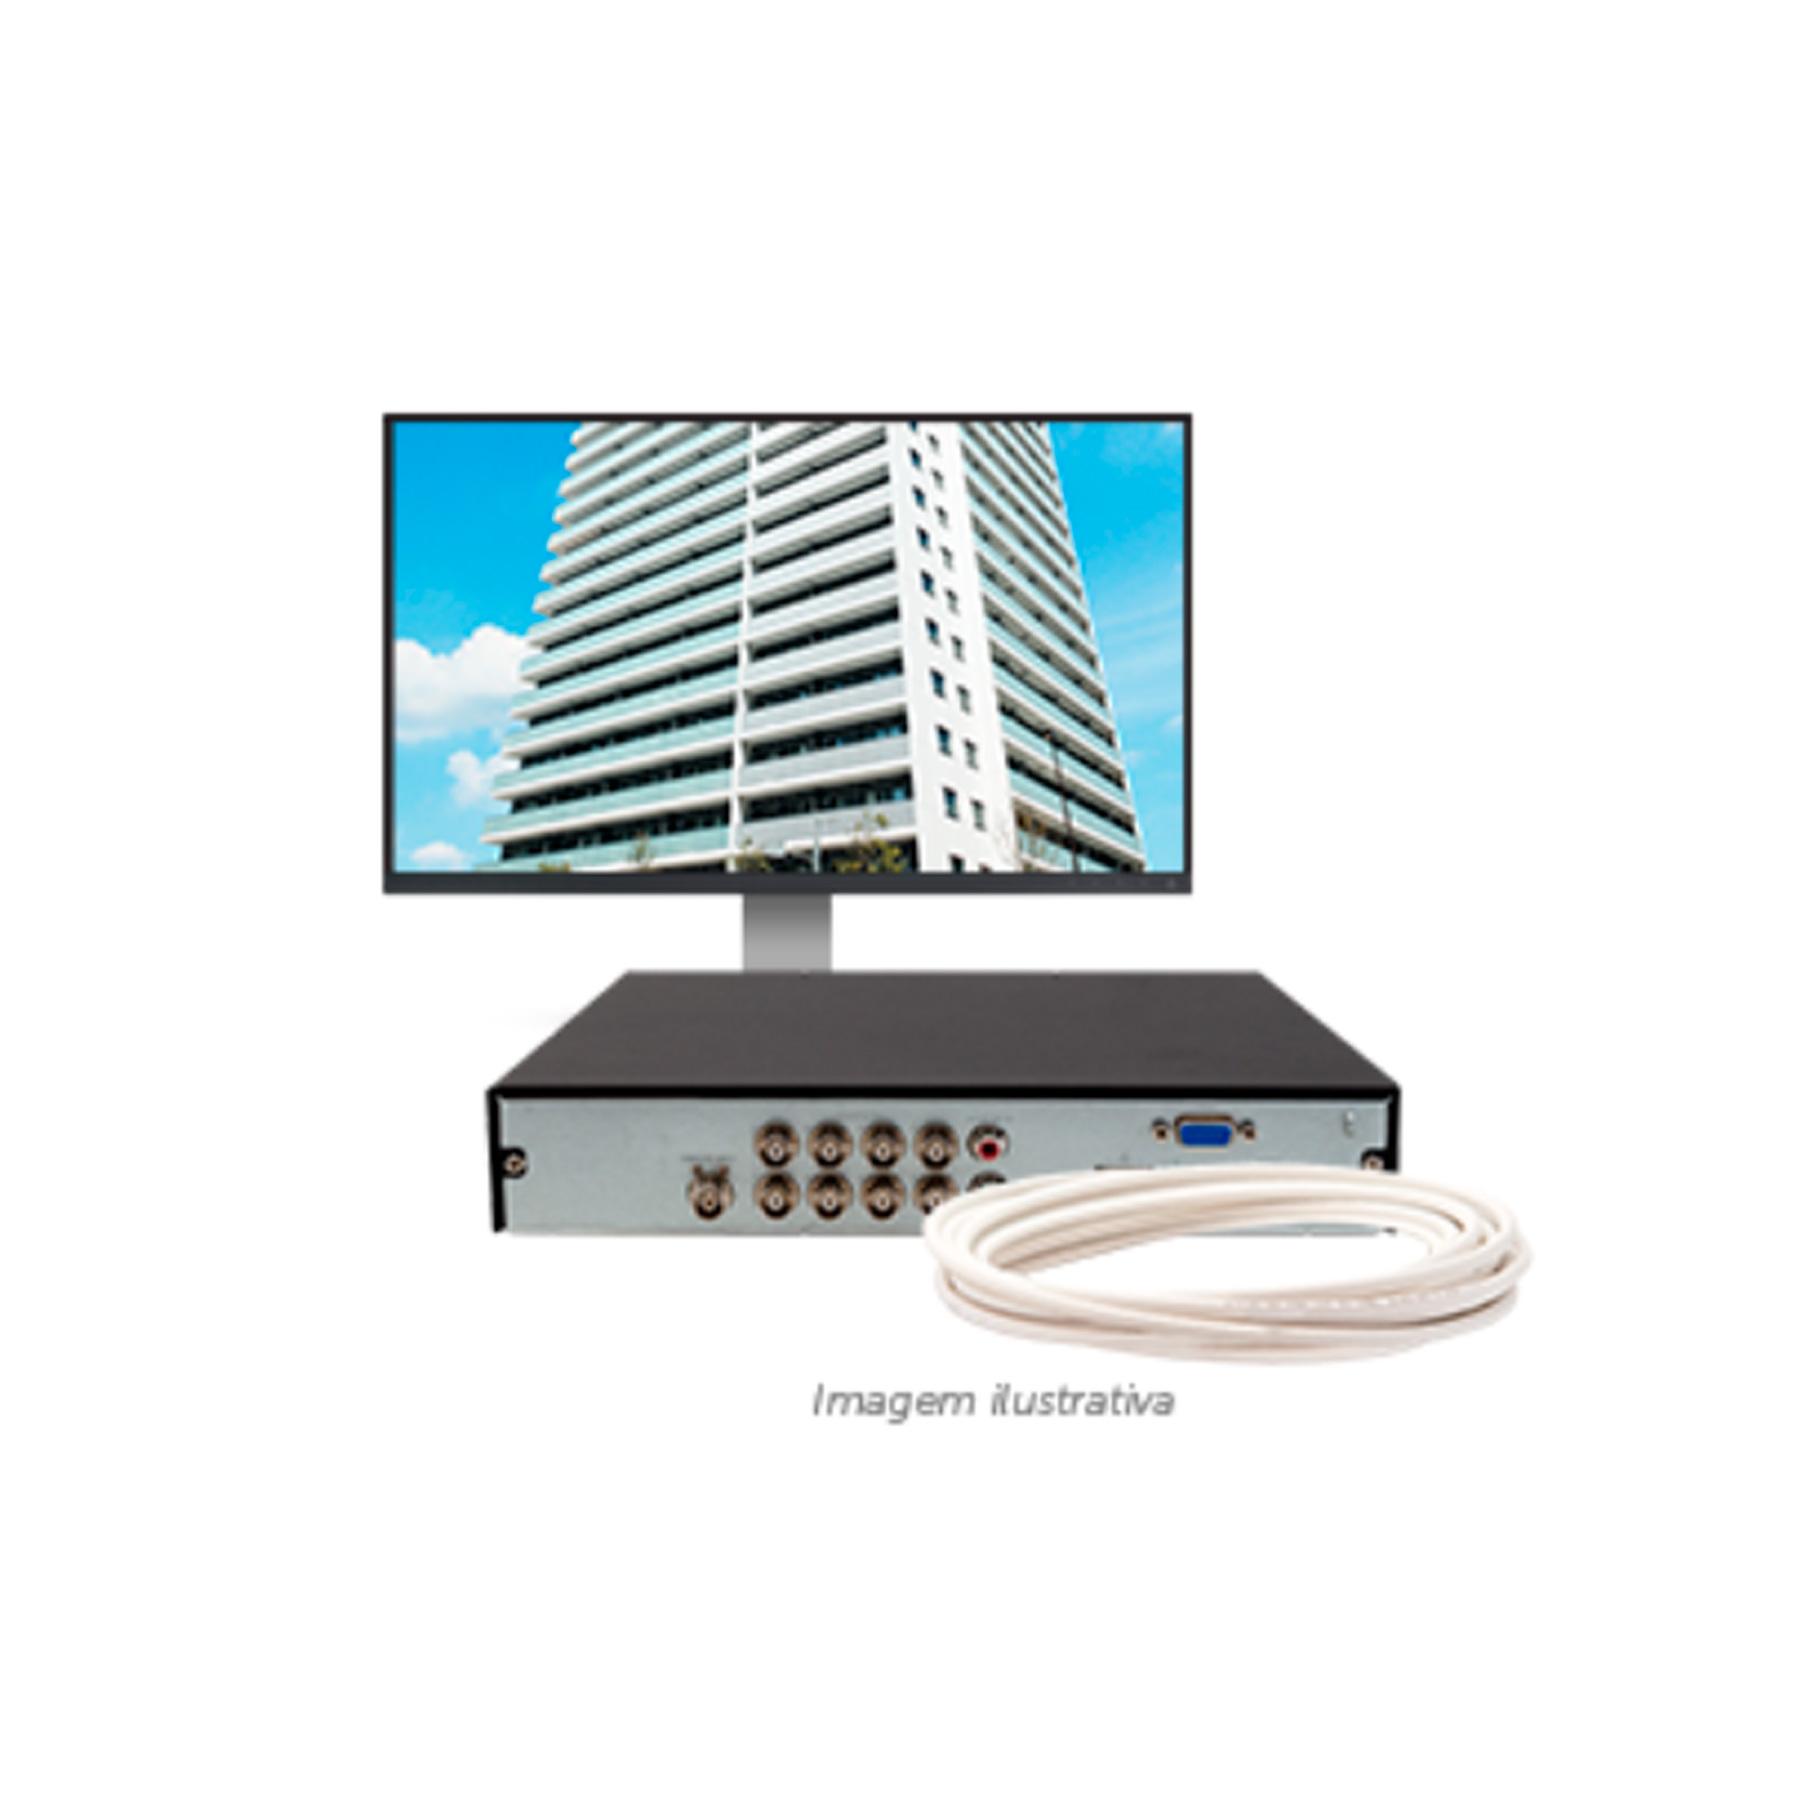 kit-intelbras-2-cameras-hd-720p-vhd-1120-d-g6-dvr-1104-intelbras-acessorios-hd-1tb-para-armazenamento-app-gratis-de-monitoramento03